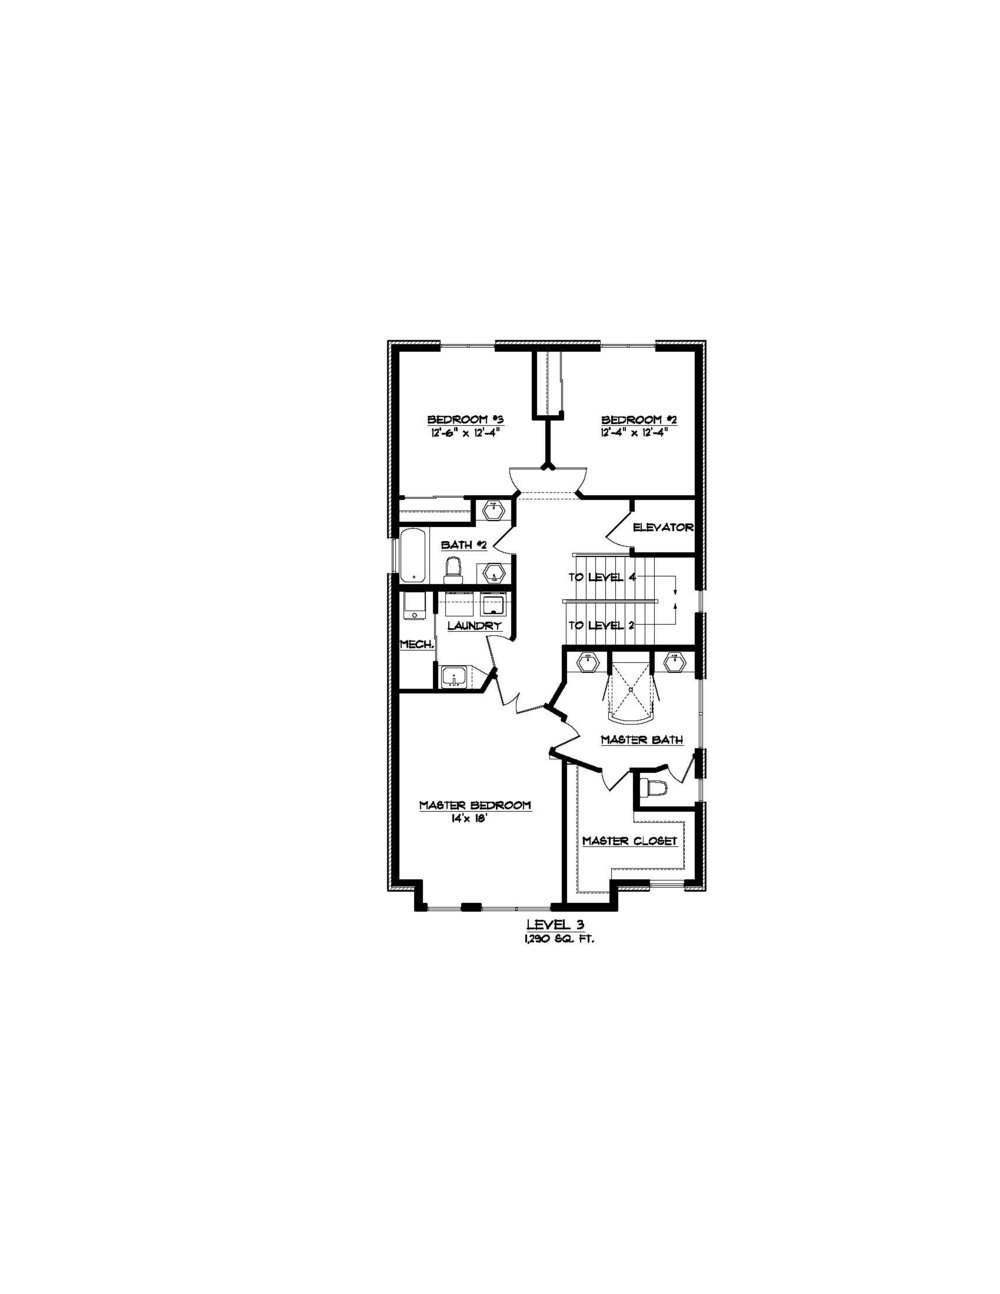 Dayton floor level 3.jpg